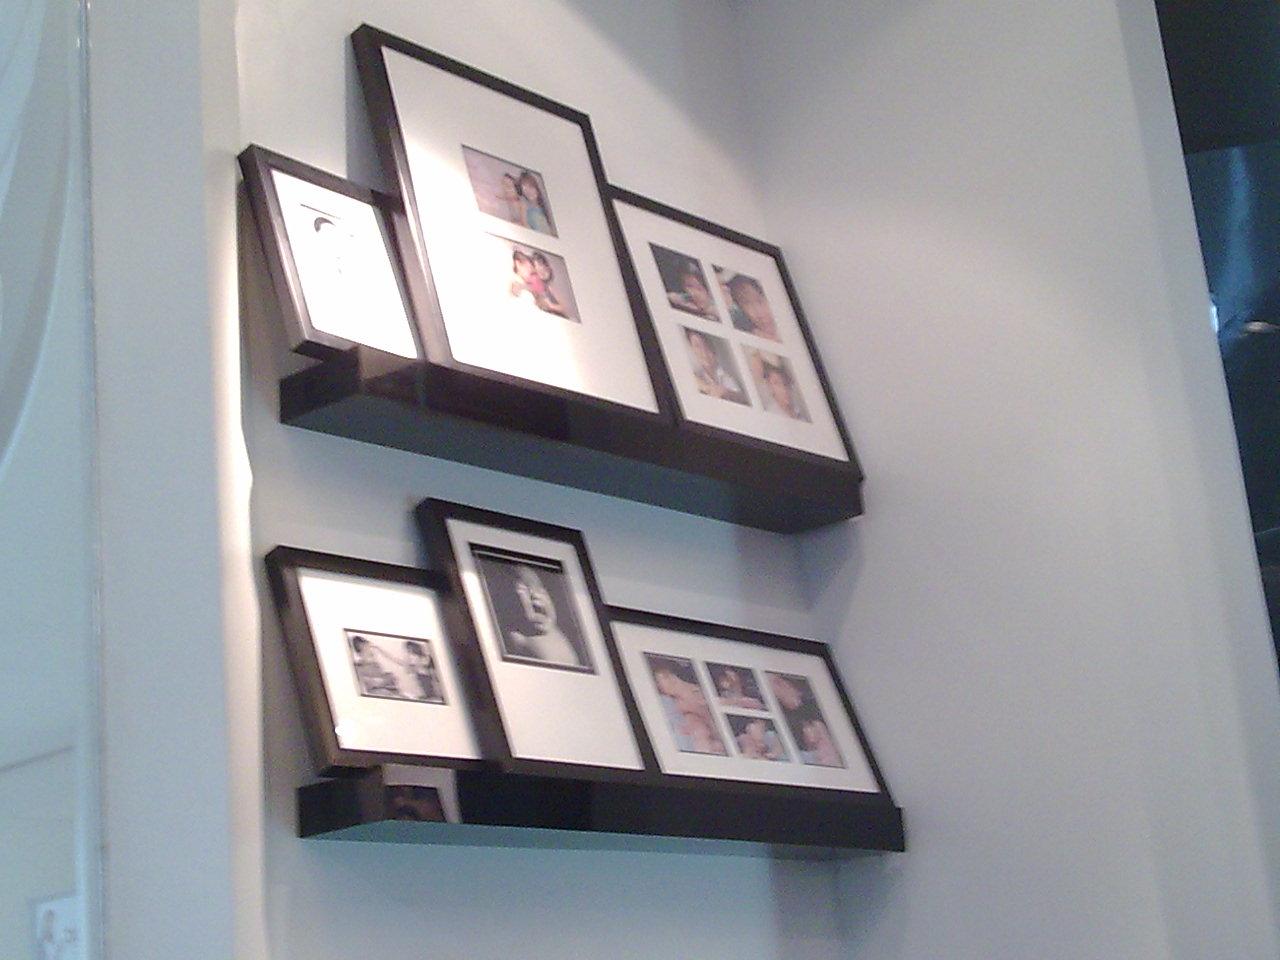 Eyeglasses Frame Cebu : Cebu Frames: Black and White Moulding Picture frame in Sm ...